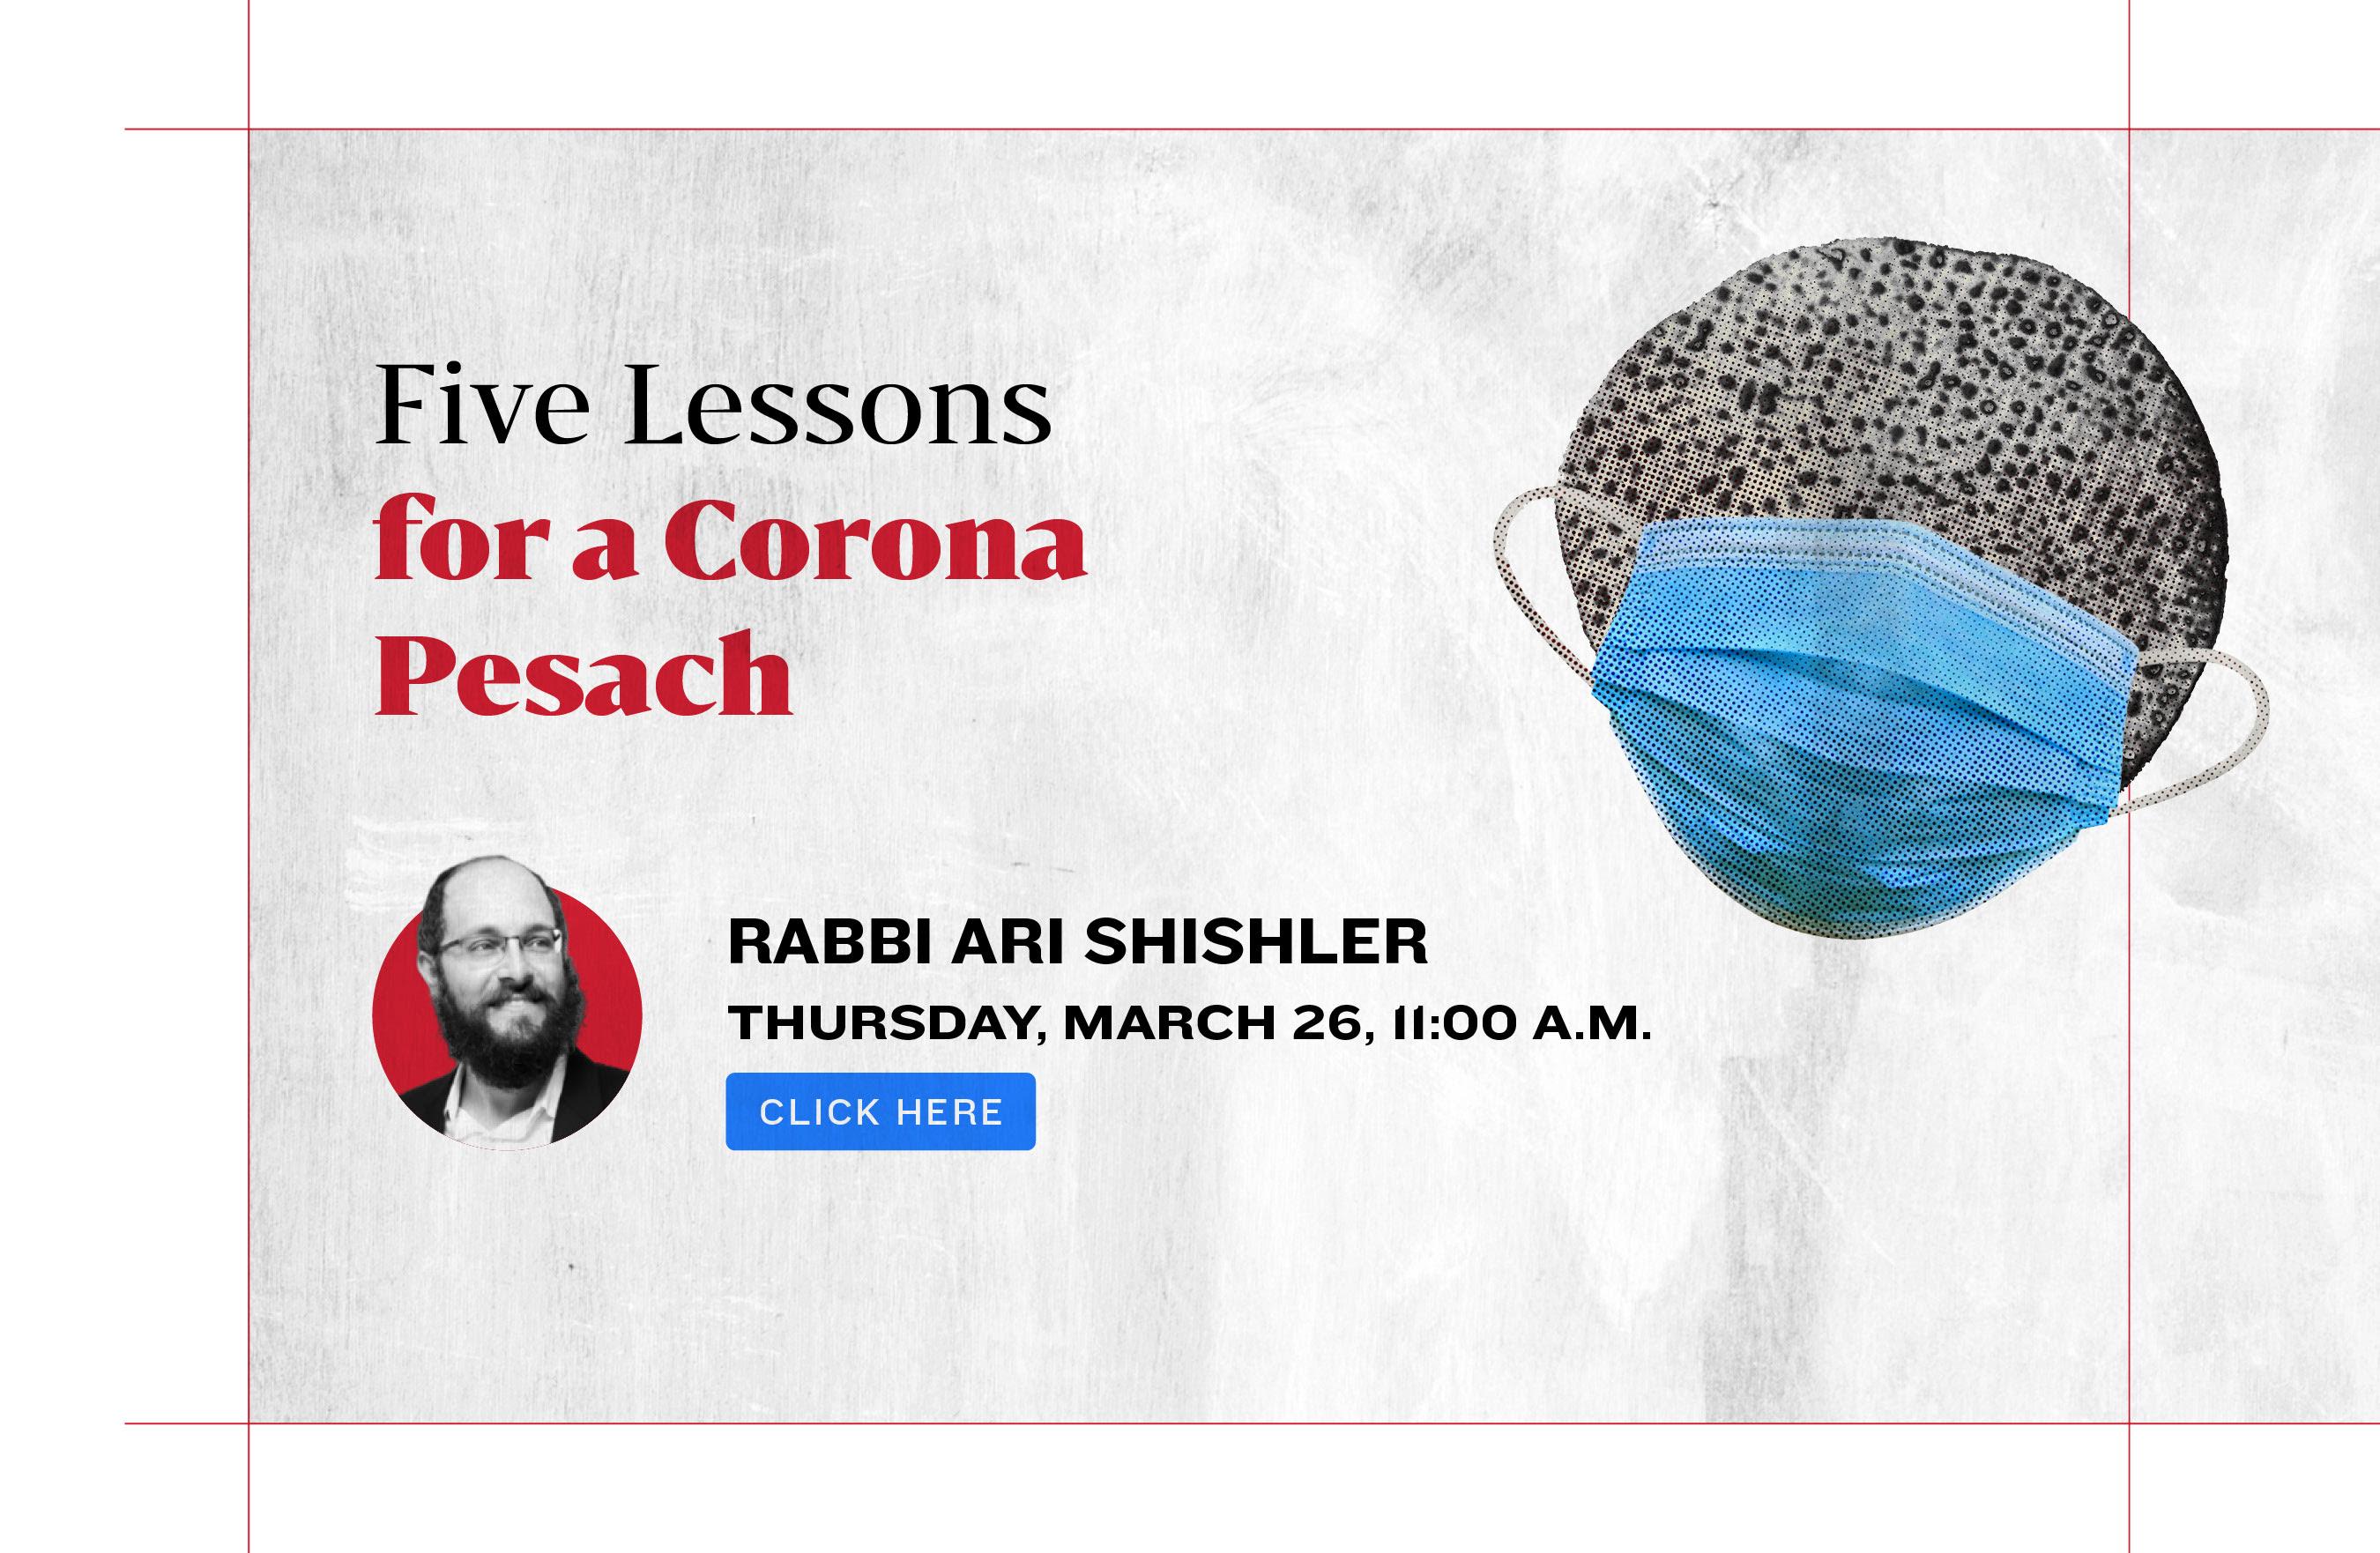 Five lessons for a Corona Pesach. Rabbi Ari Shishler